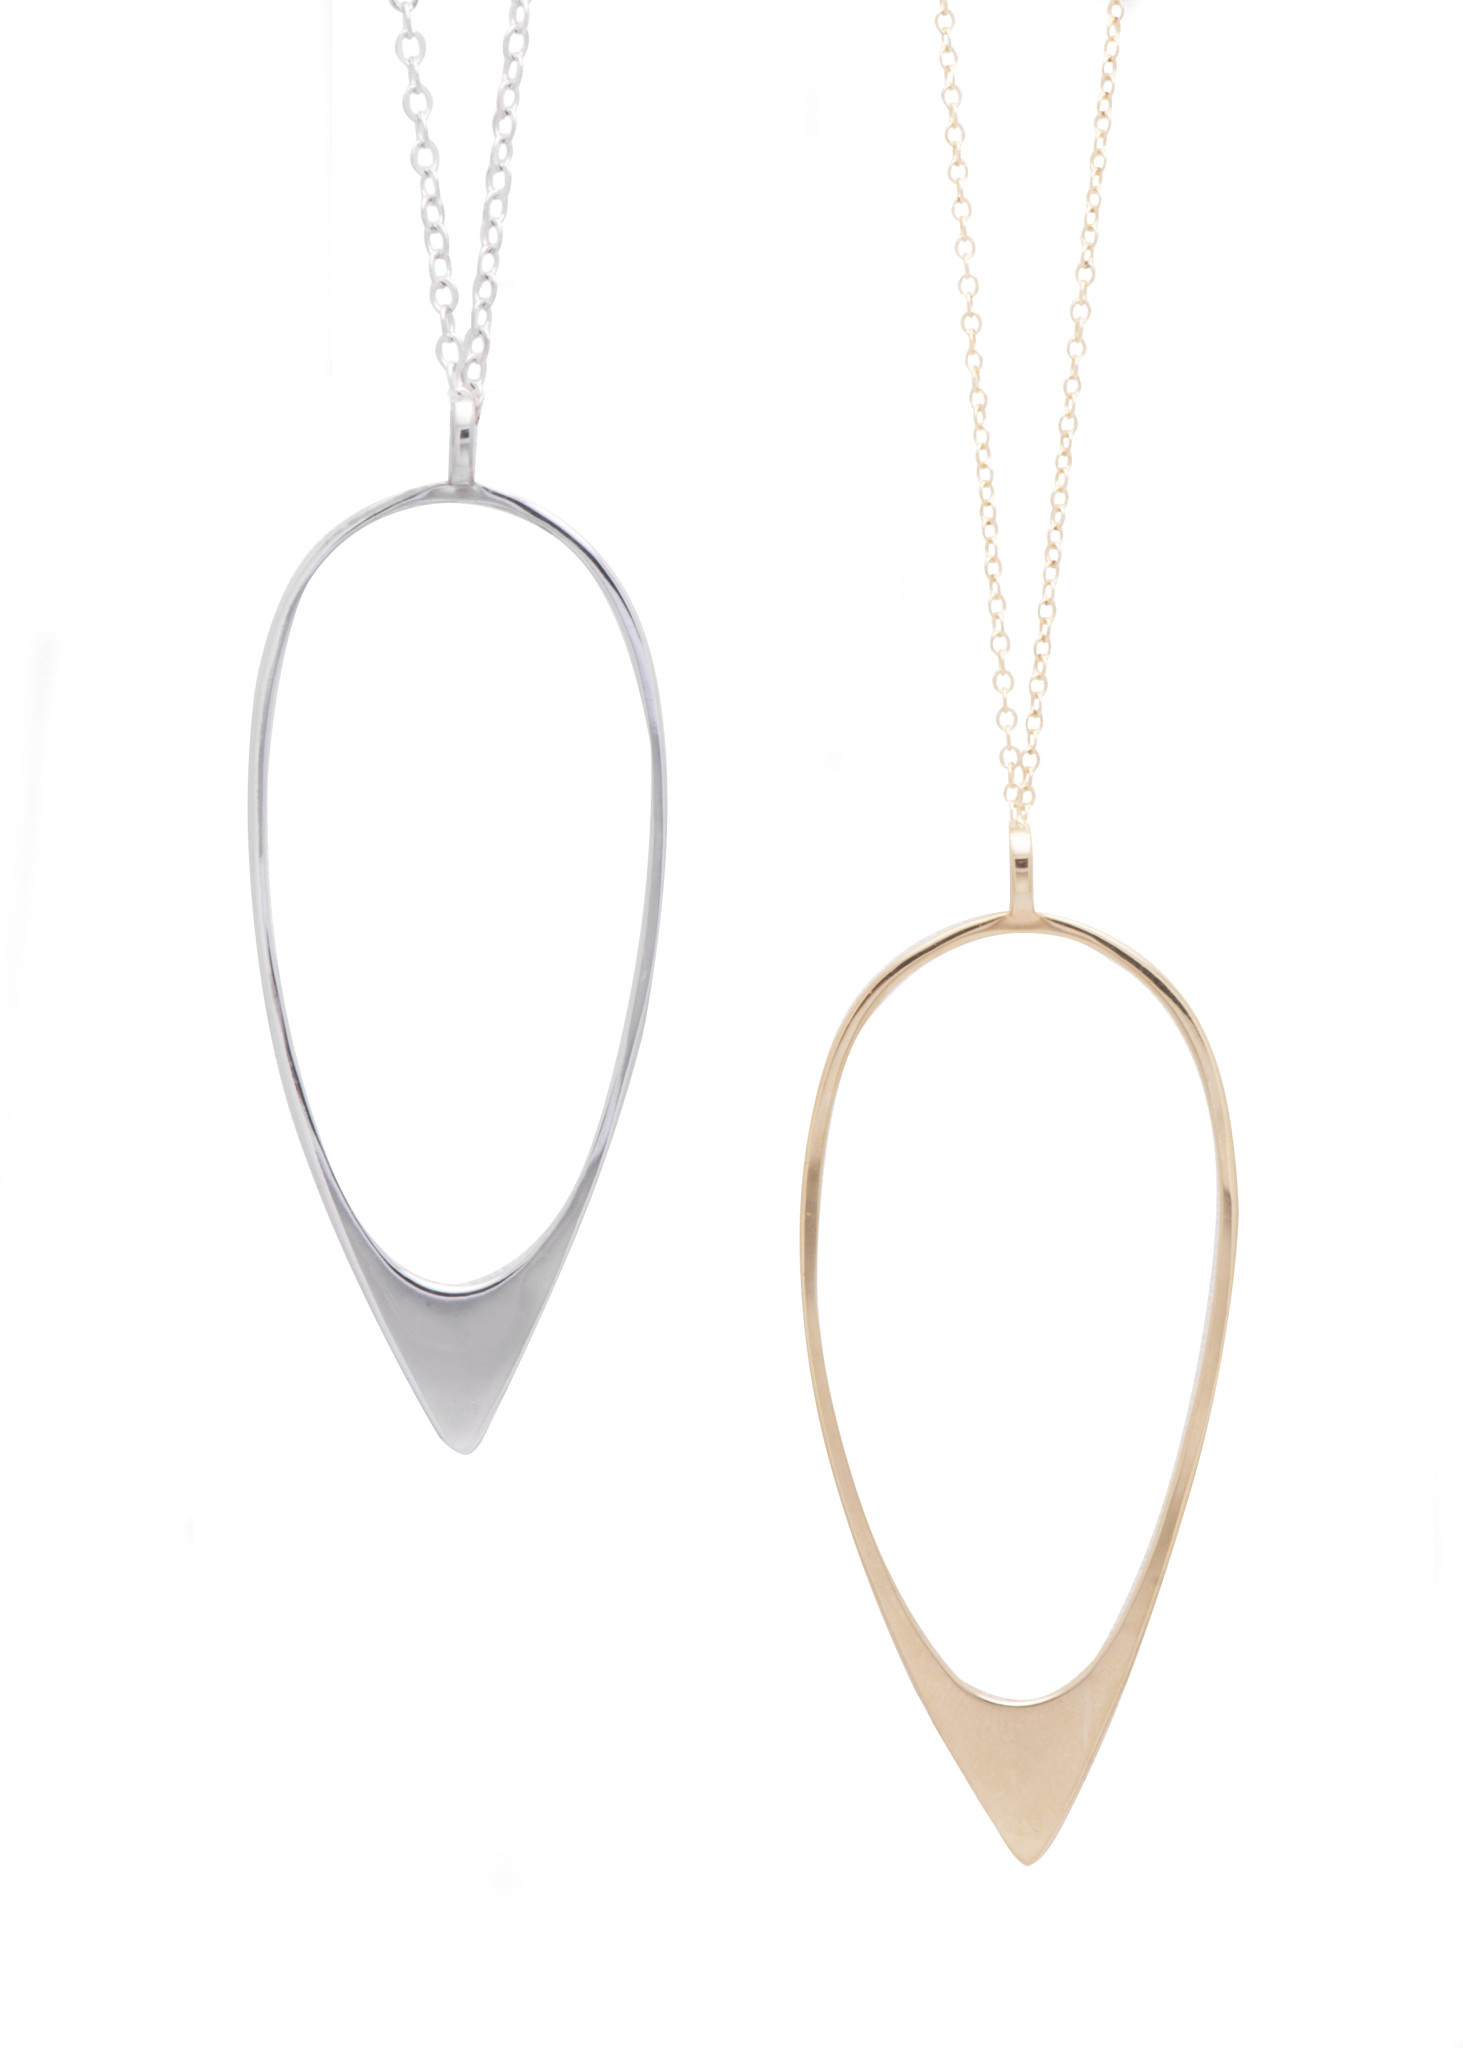 Sarah Mulder Jewelry Ariam Necklace Large